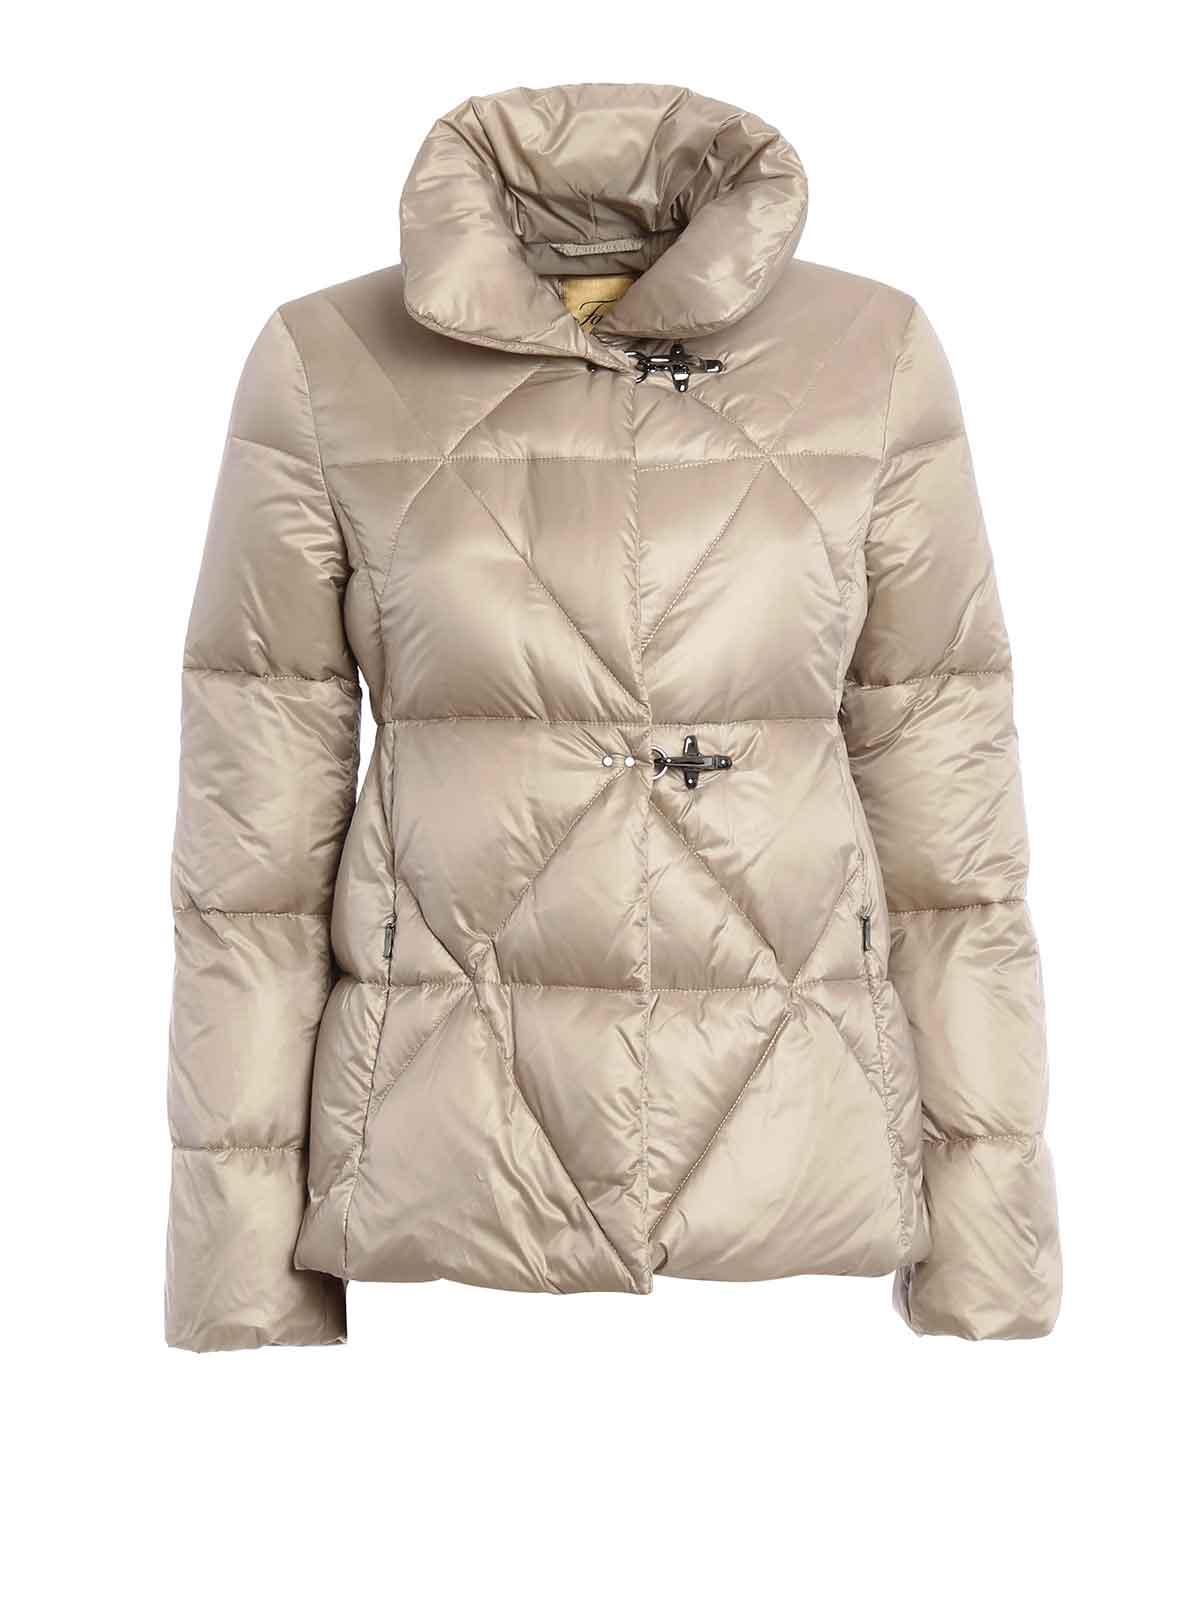 newest collection 75f75 1aa27 Fay - Piumino corto trapuntato - giacche imbottite ...